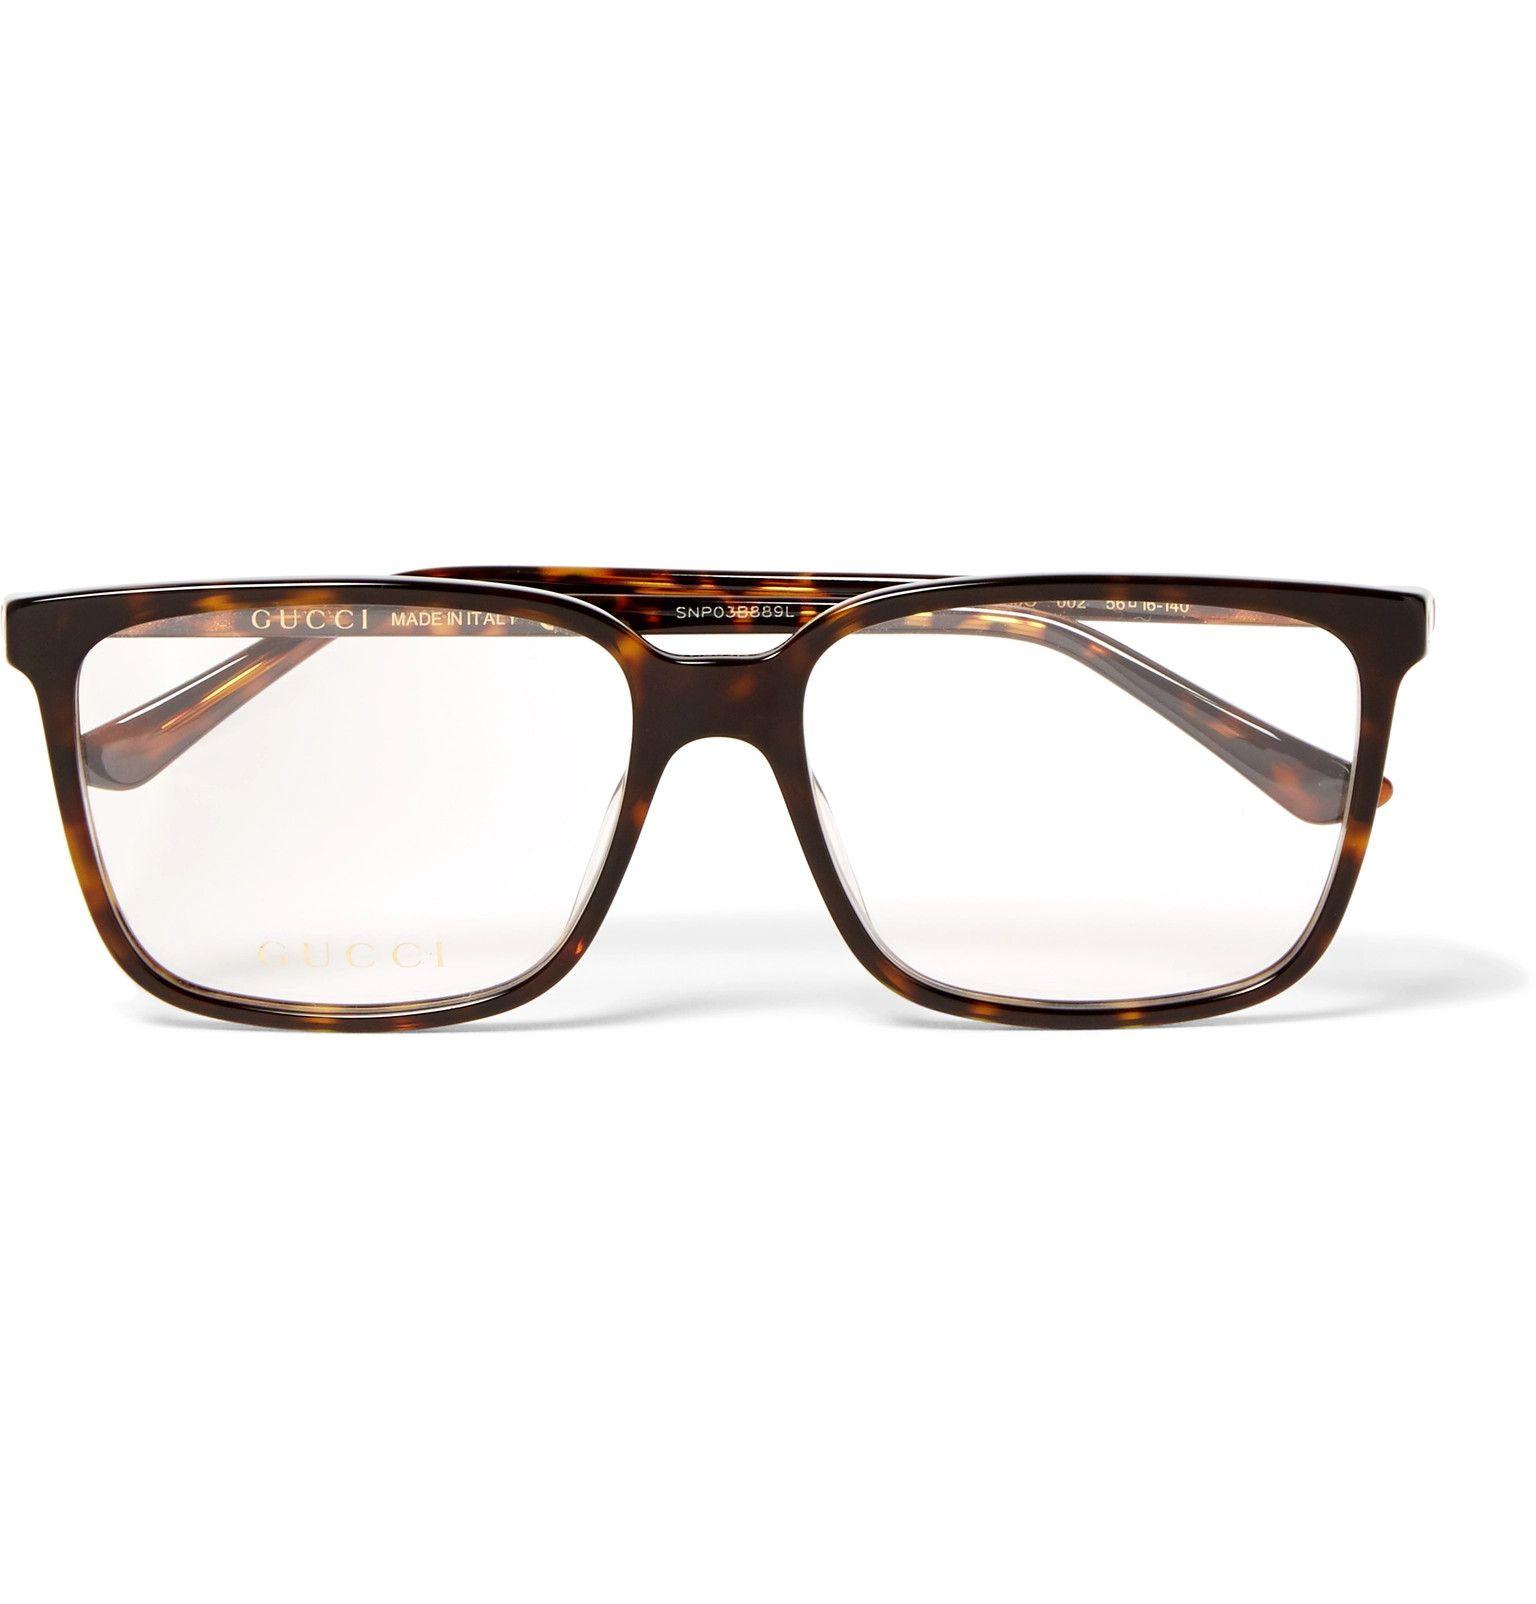 2d25303e59 Gucci - Square-Frame Tortoiseshell Acetate Optical Glasses